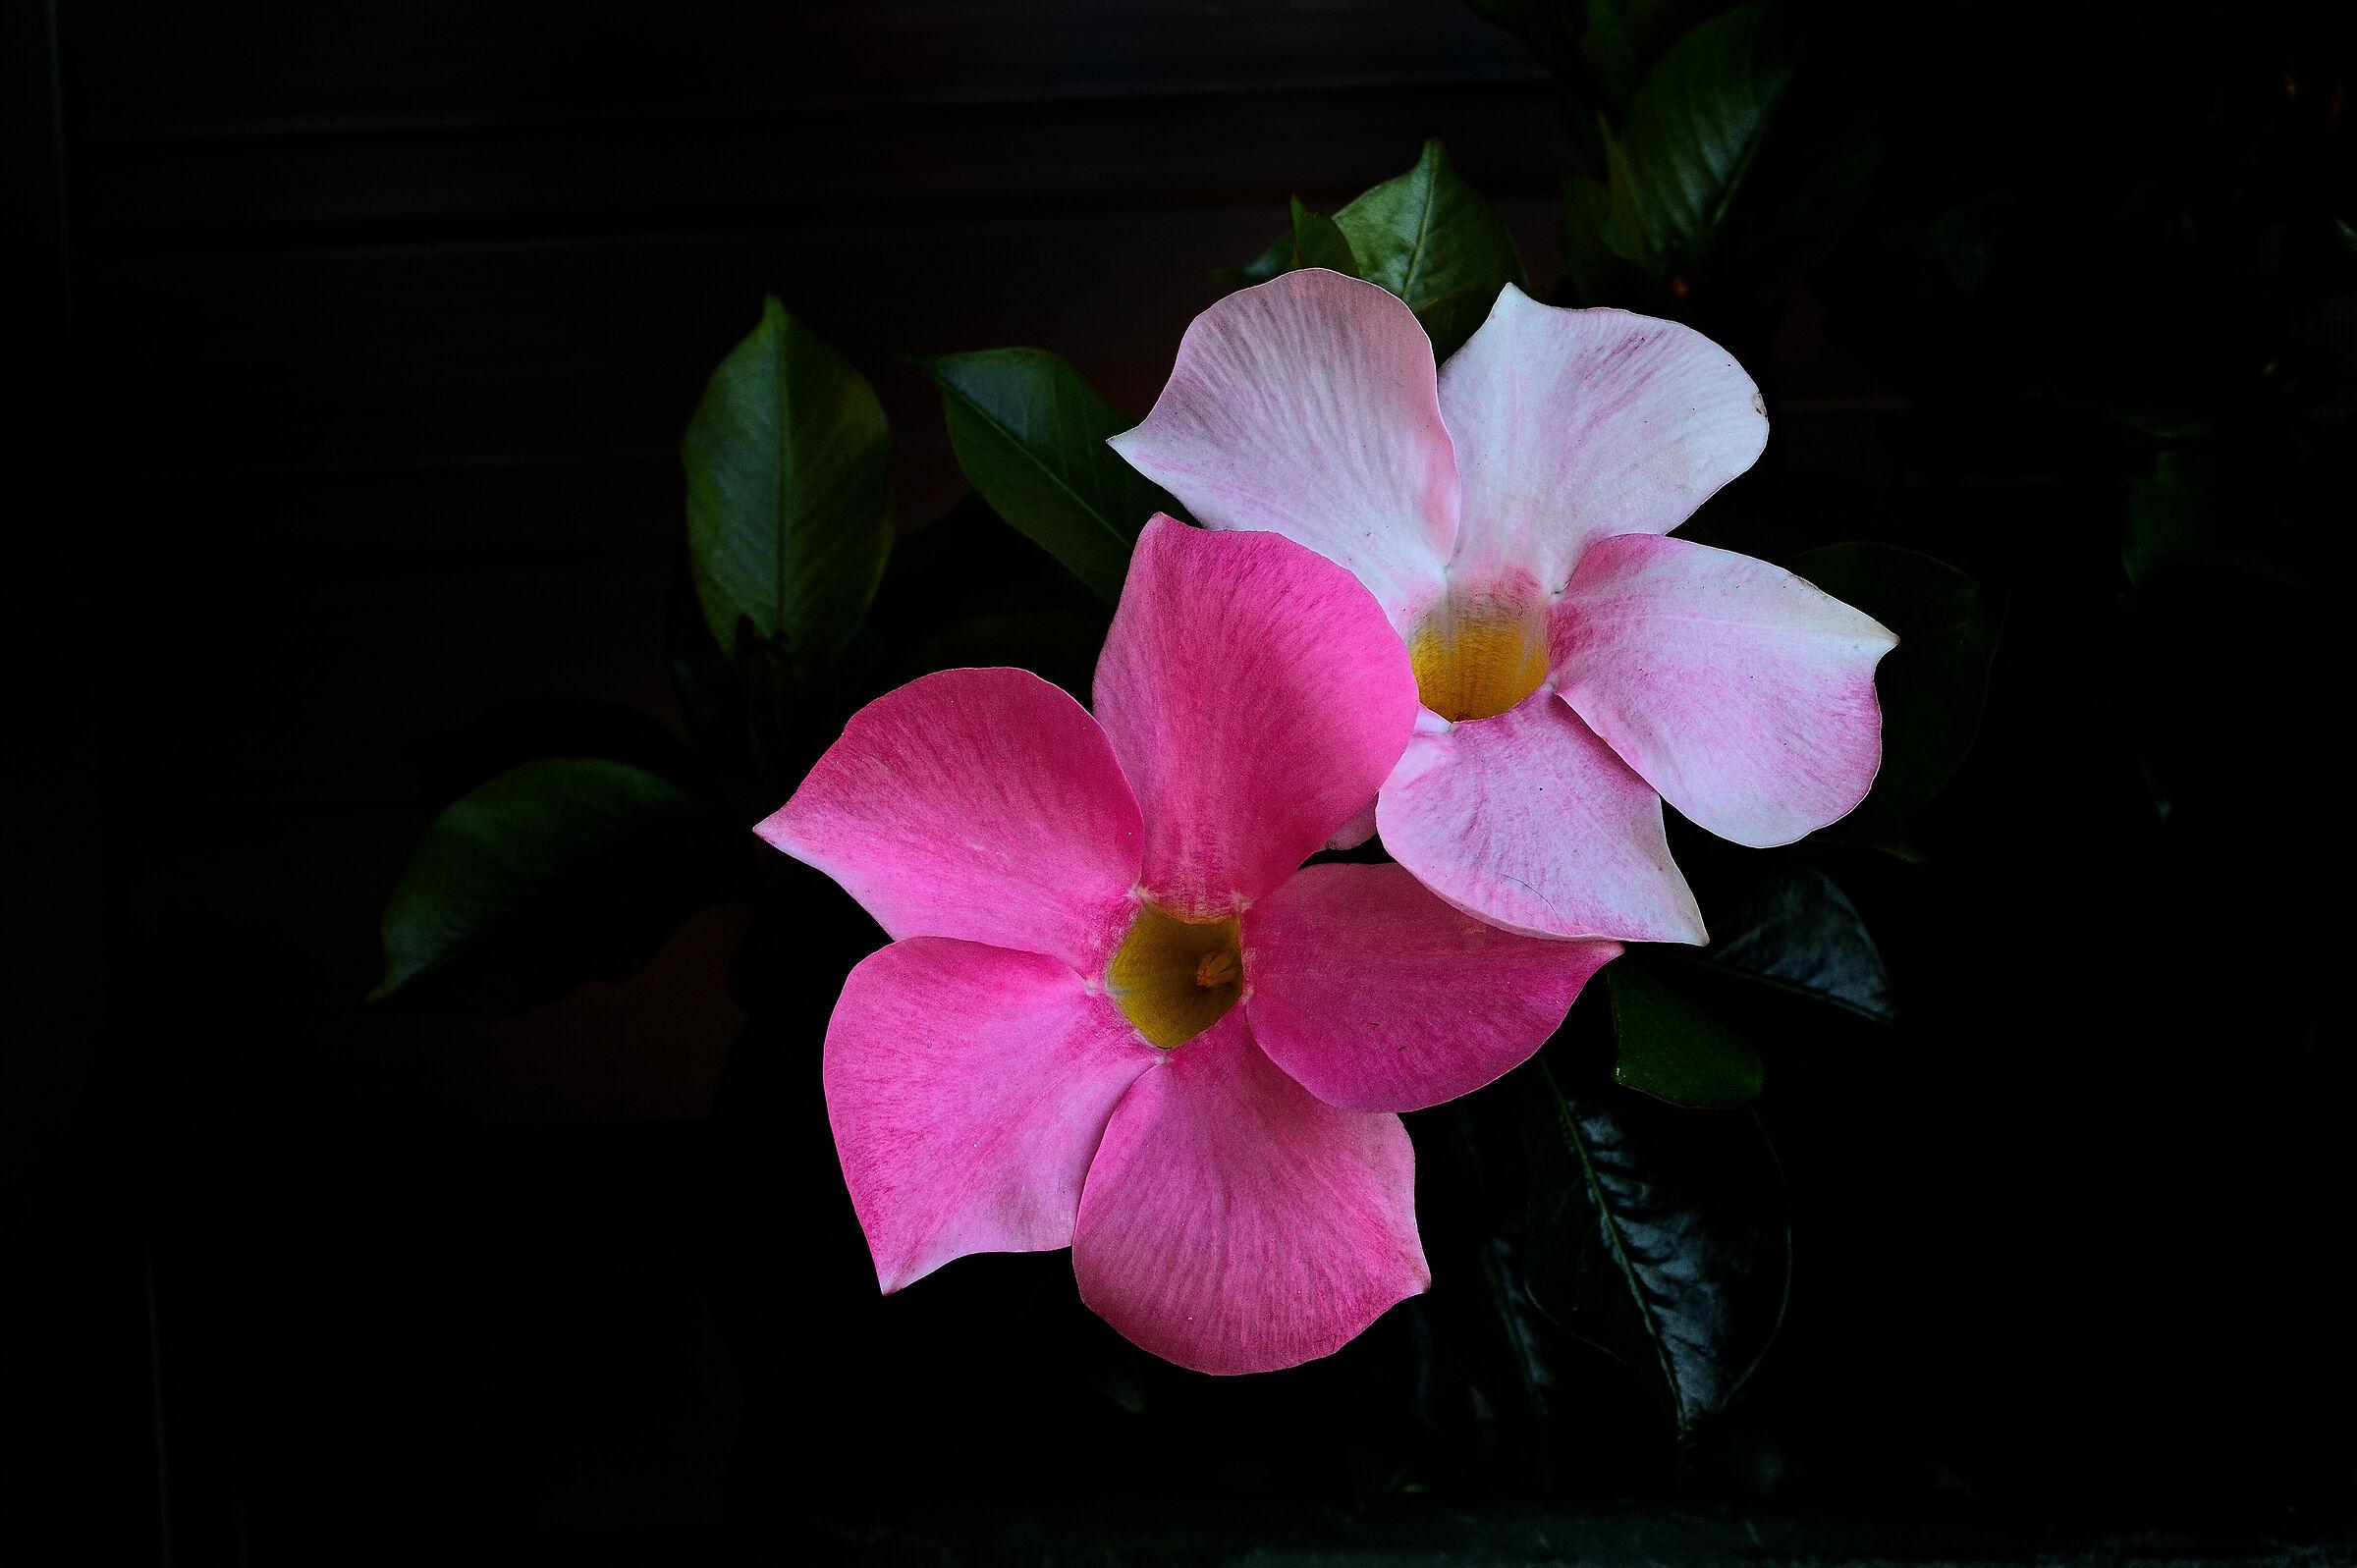 Sundaville Rose...